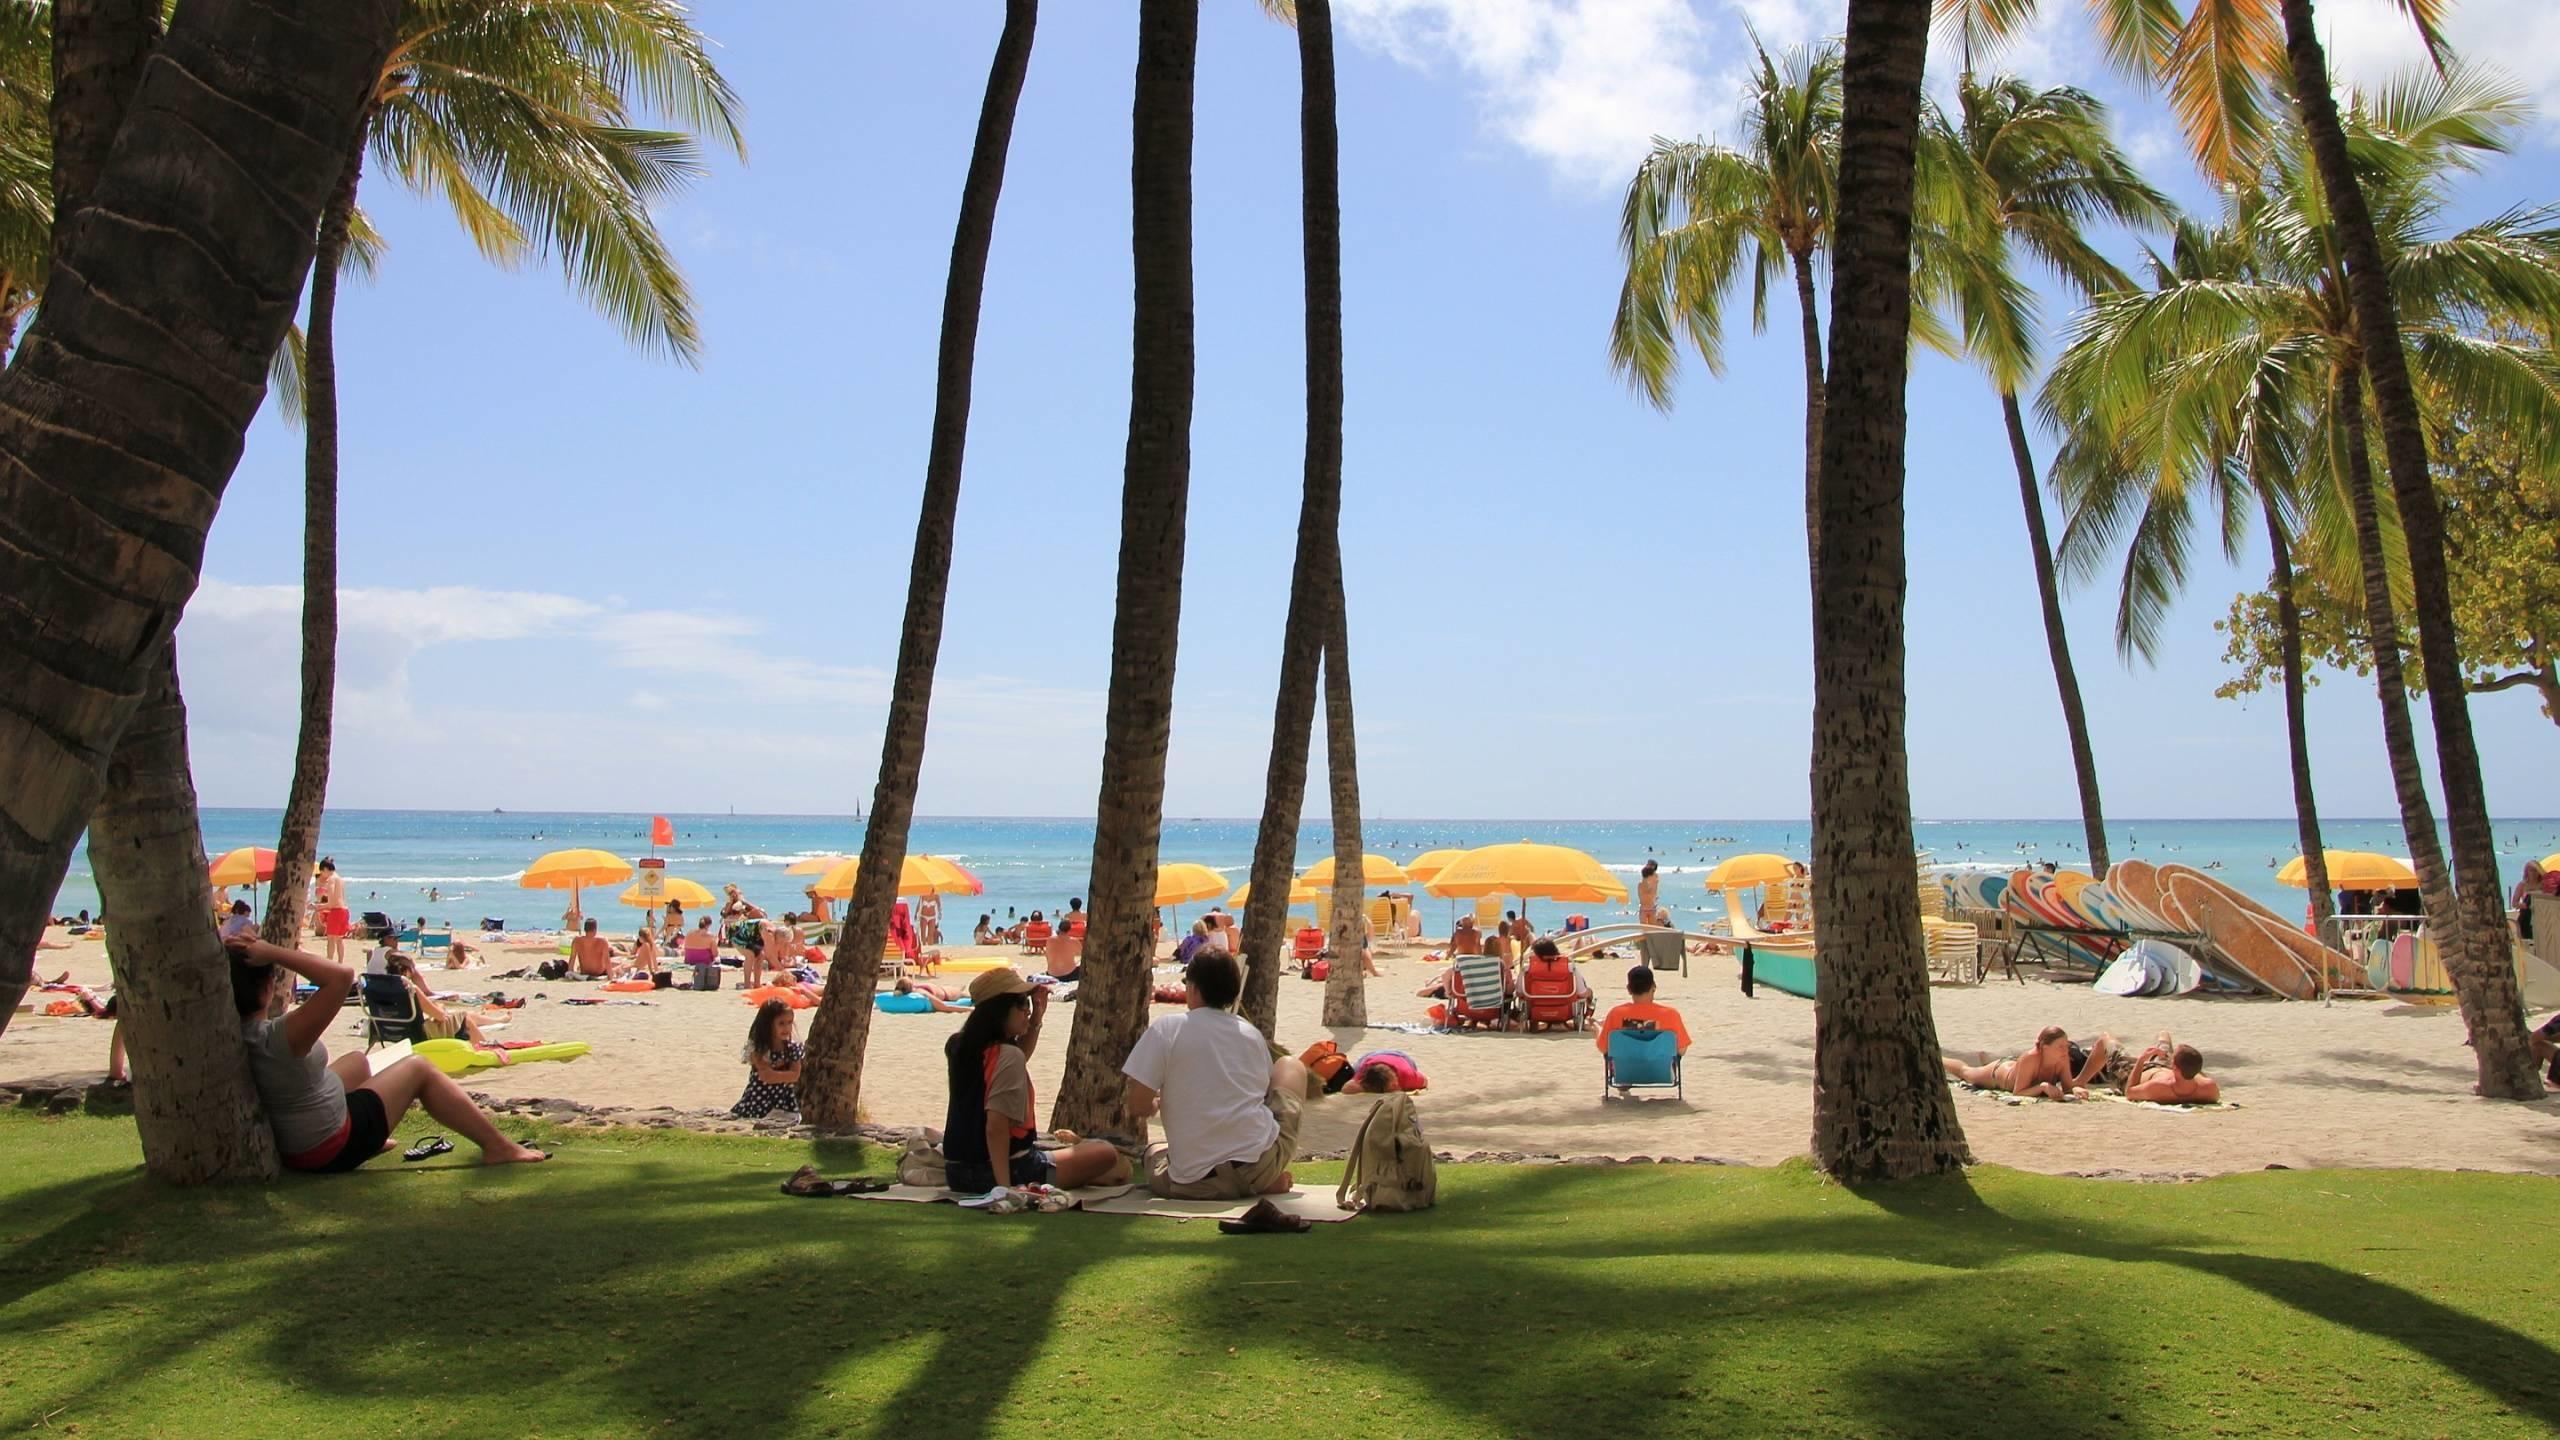 Res: 2560x1440, Waikiki Beach Hawaii wallpaper - 1281353